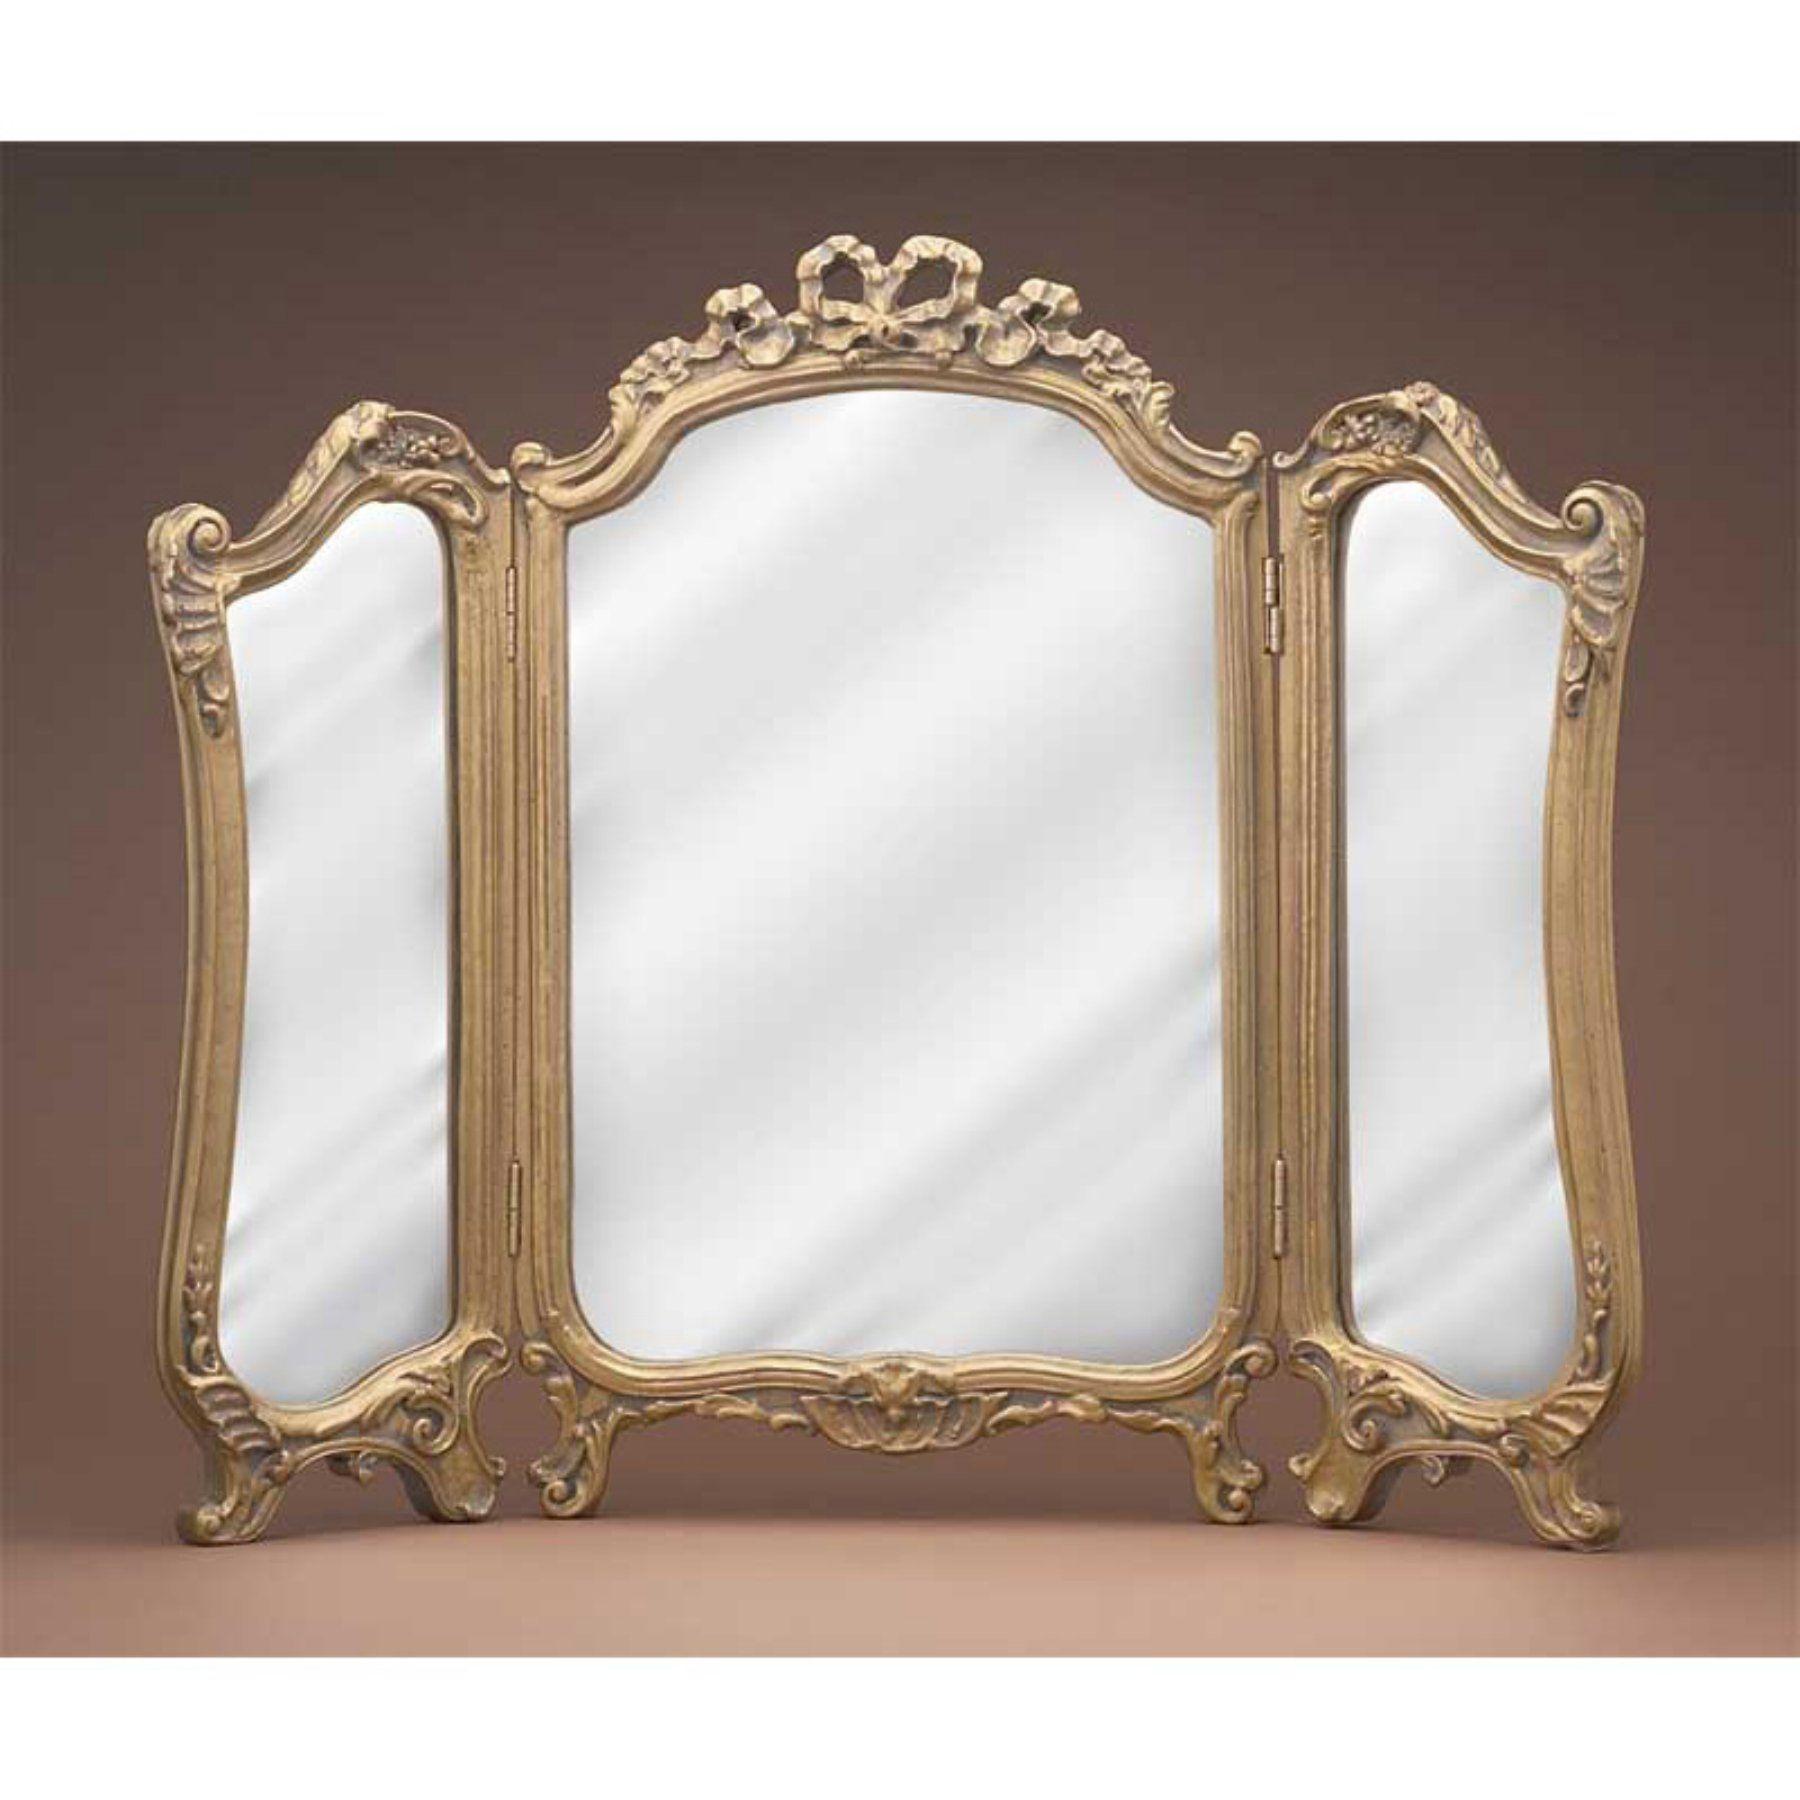 Hickory Manor House Tri Fold Vanity Mirror 26.75W x 31